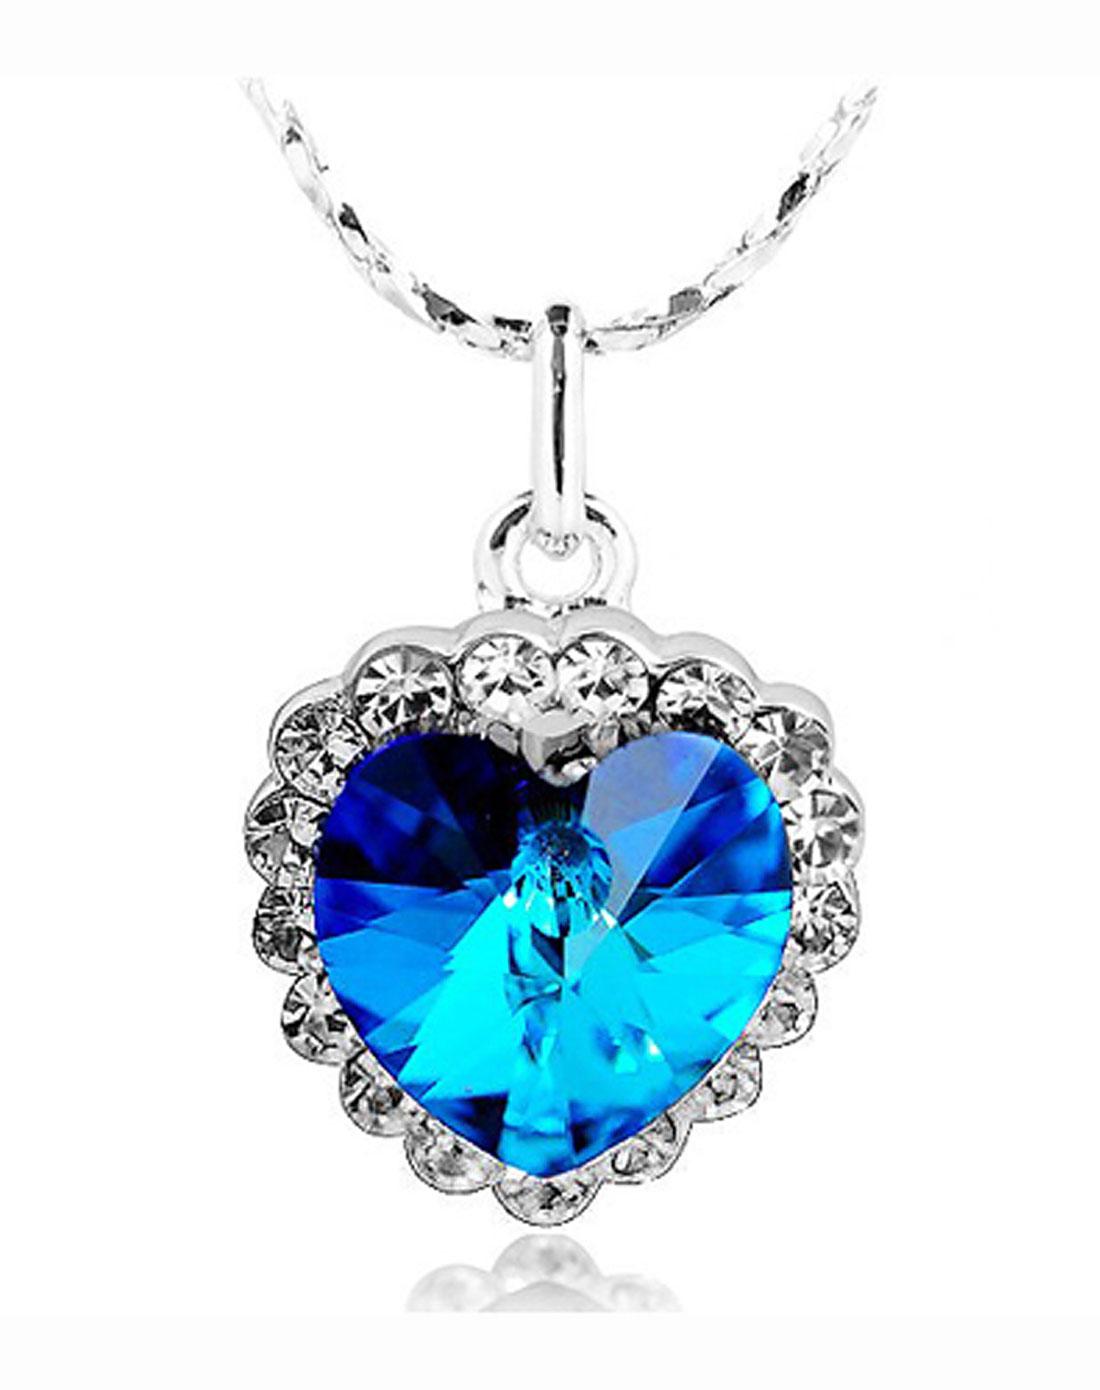 �Y��yd)_your-d蓝色梦幻海洋之心施华洛水晶项链yd100166_唯品